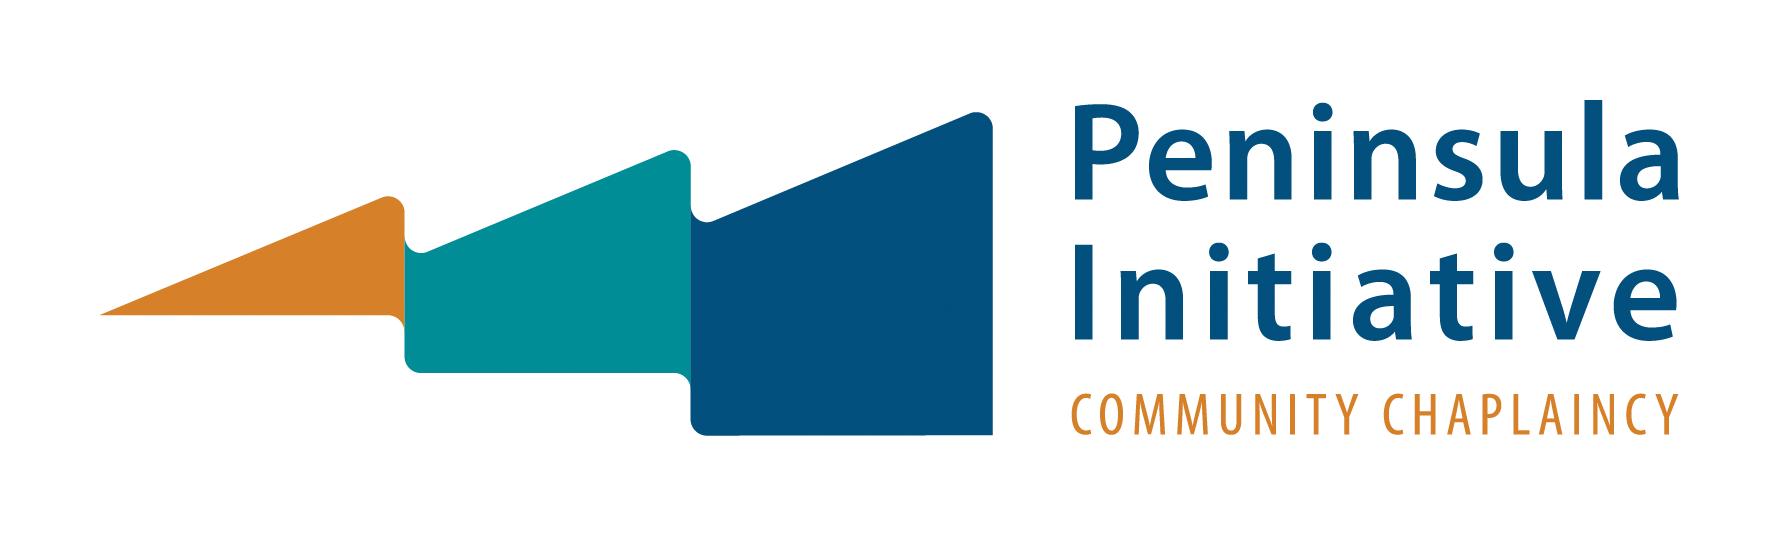 Peninsula Initiative